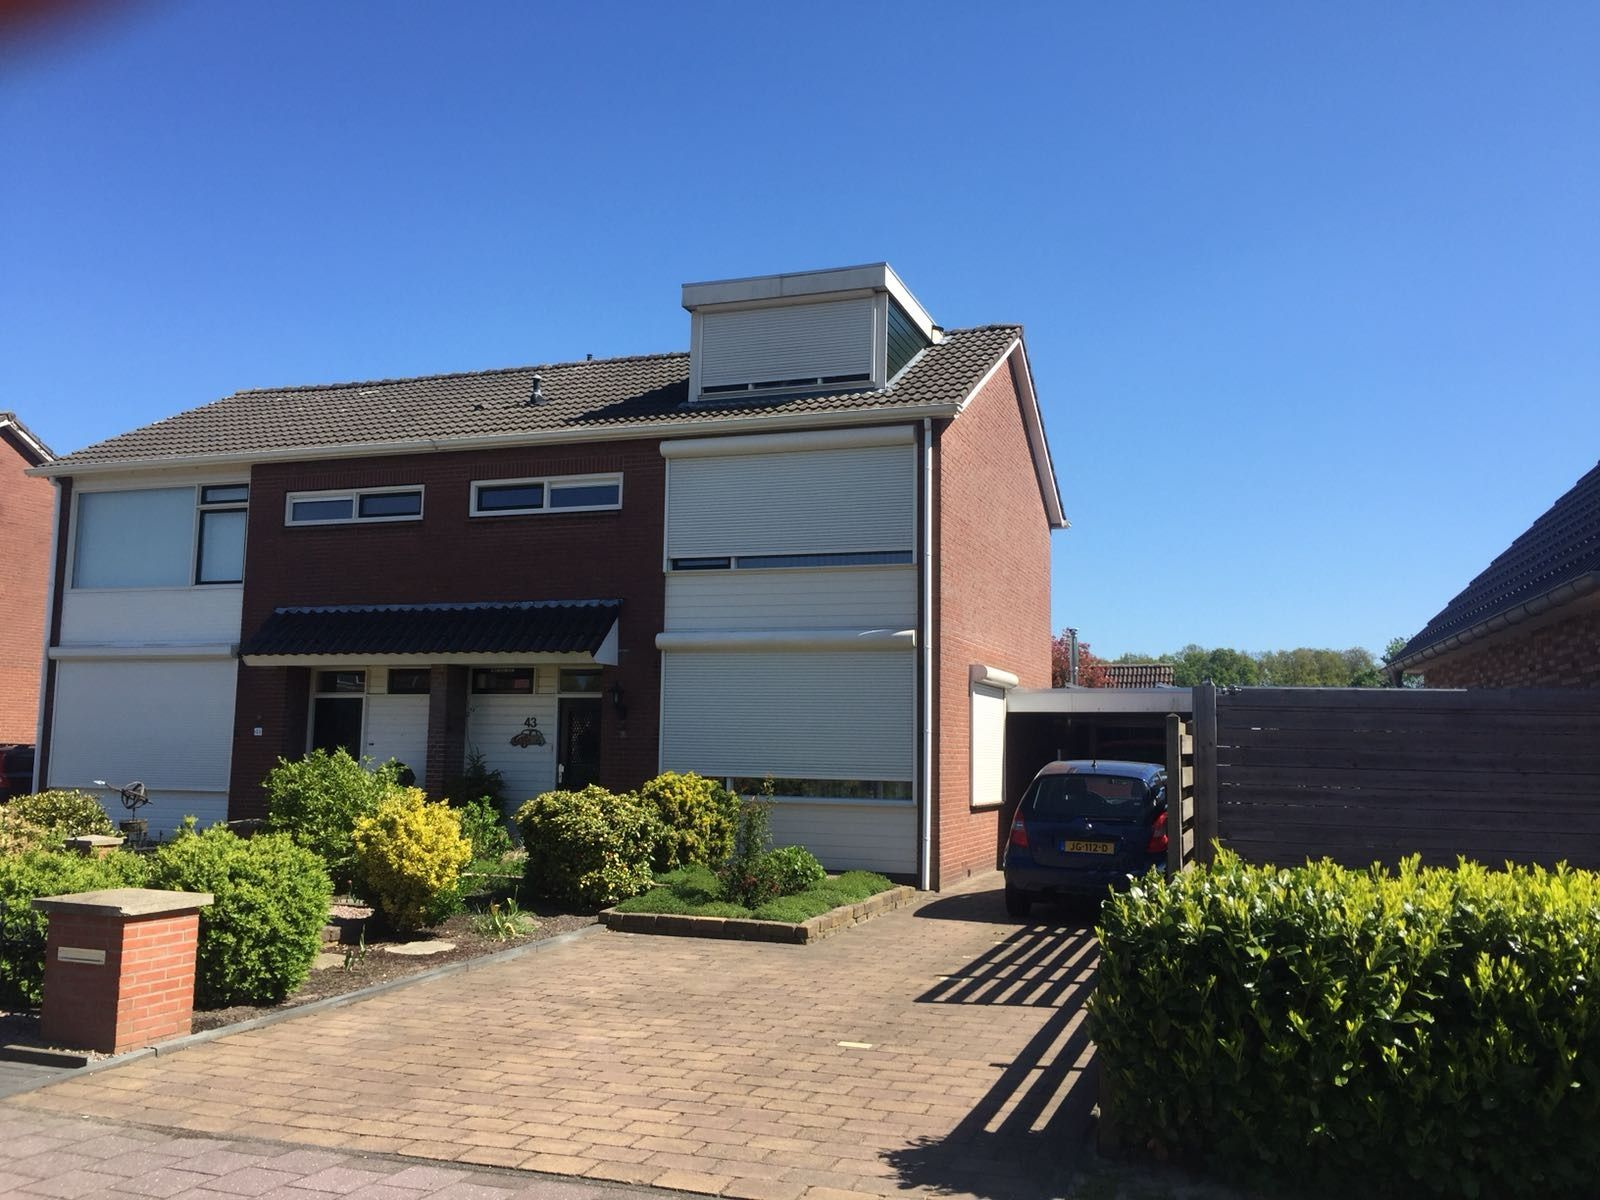 Willem Grolstraat 43, Emmen